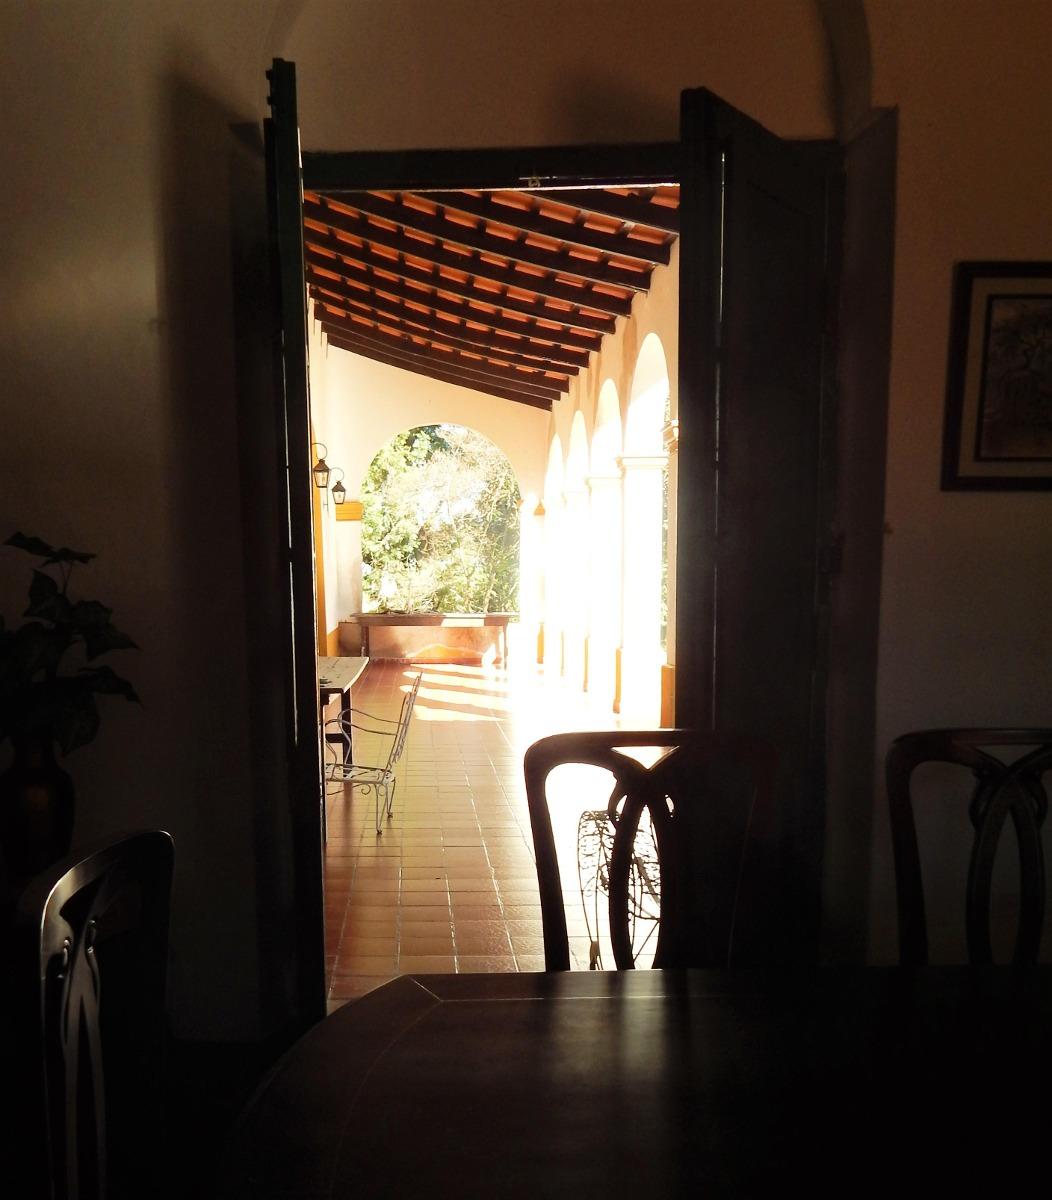 excelente casco antiguo - san lorenzo - salta